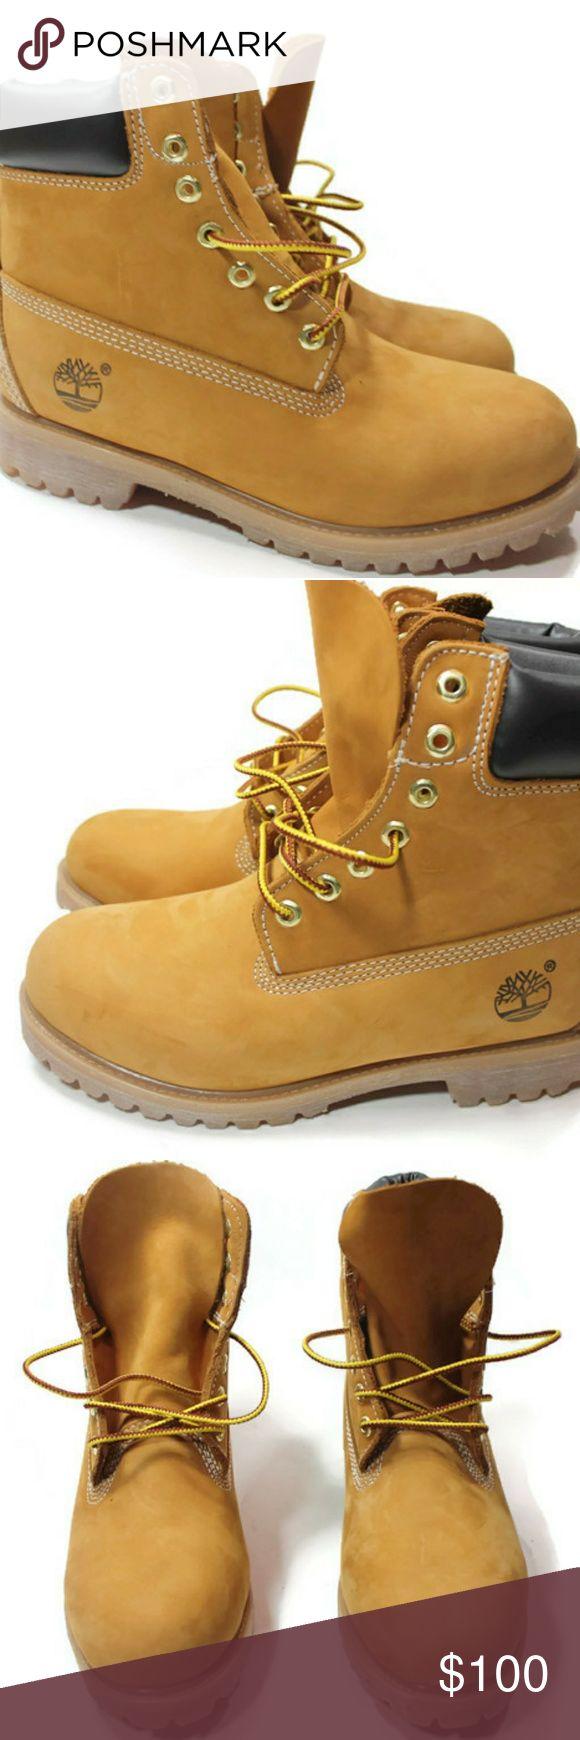 Men Timberland boots Men Wheat Timberland boots Timberland Shoes Boots